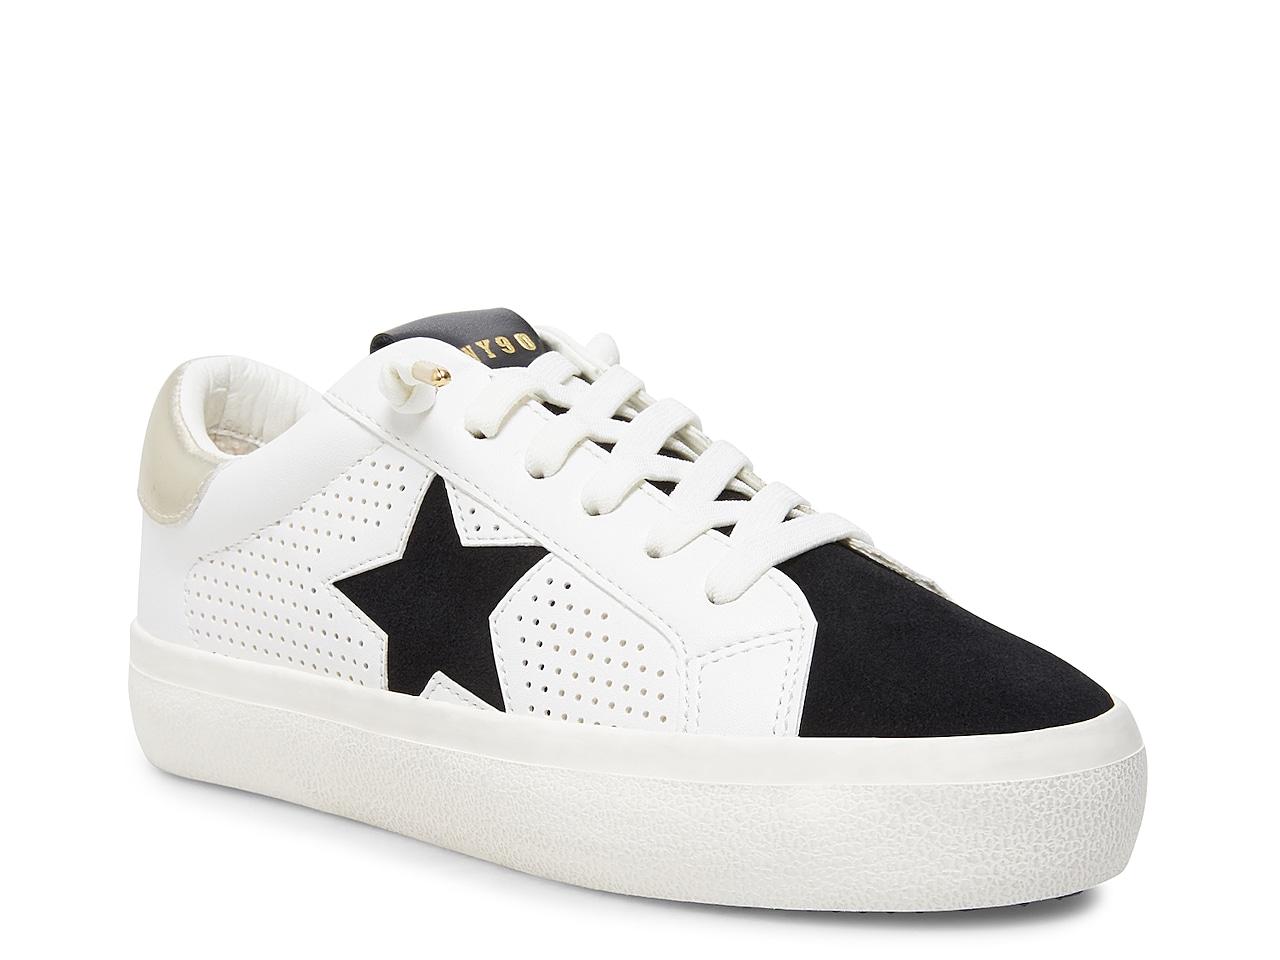 Starling Flatform Sneaker